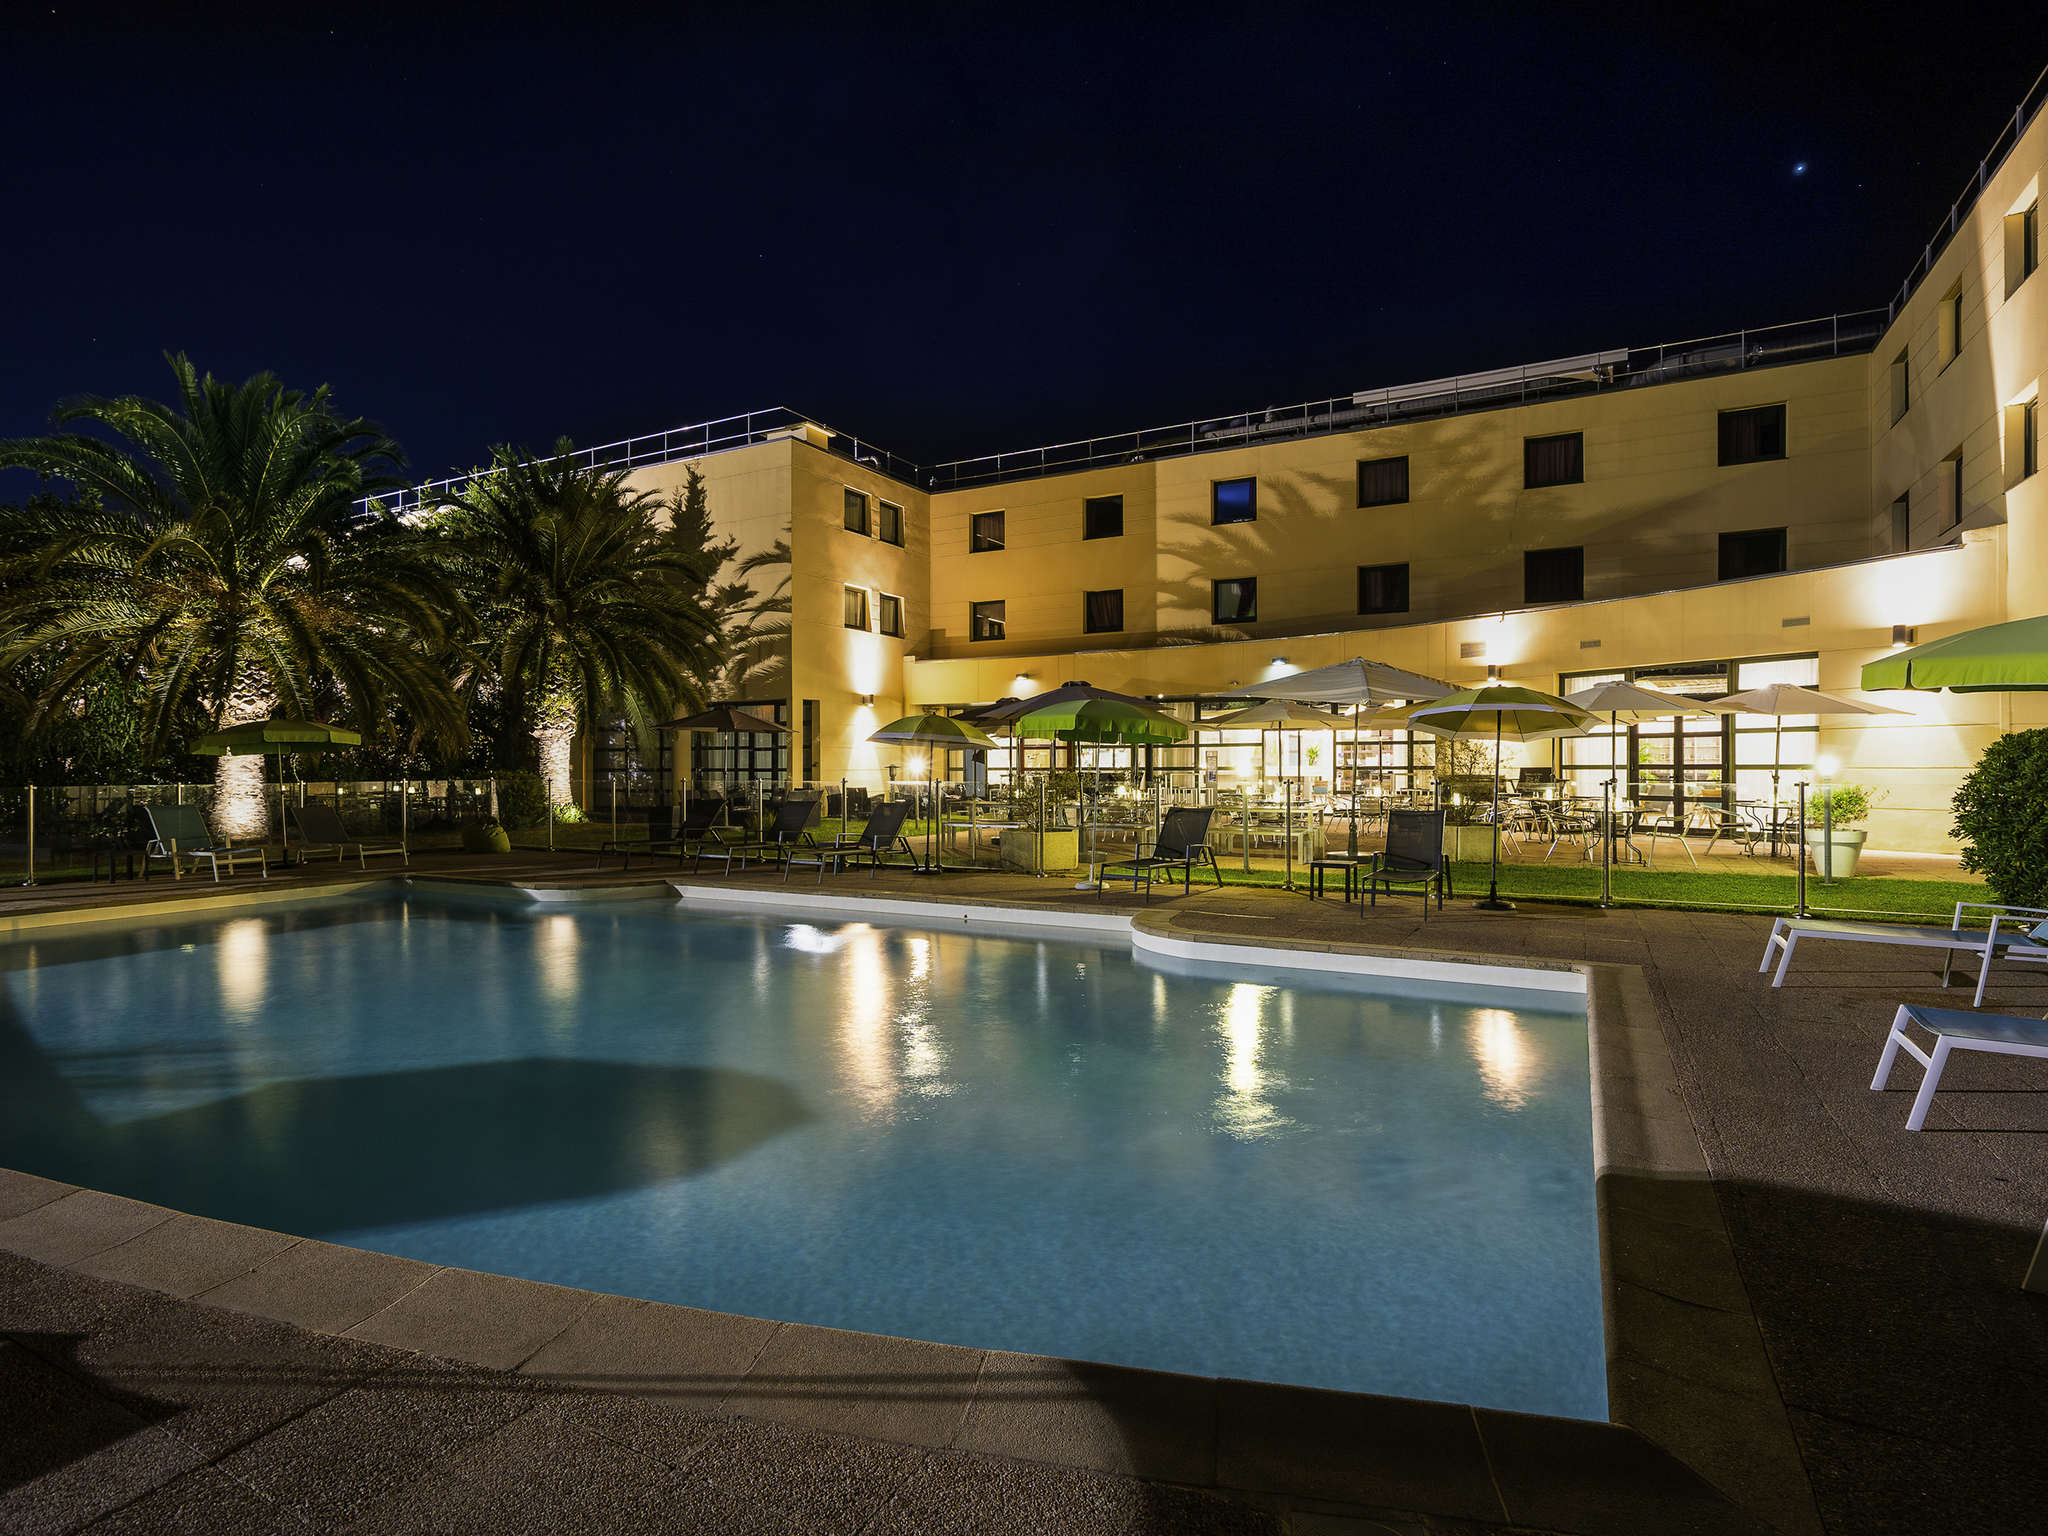 Hotel – Hotel Mercure Cannes Mandelieu